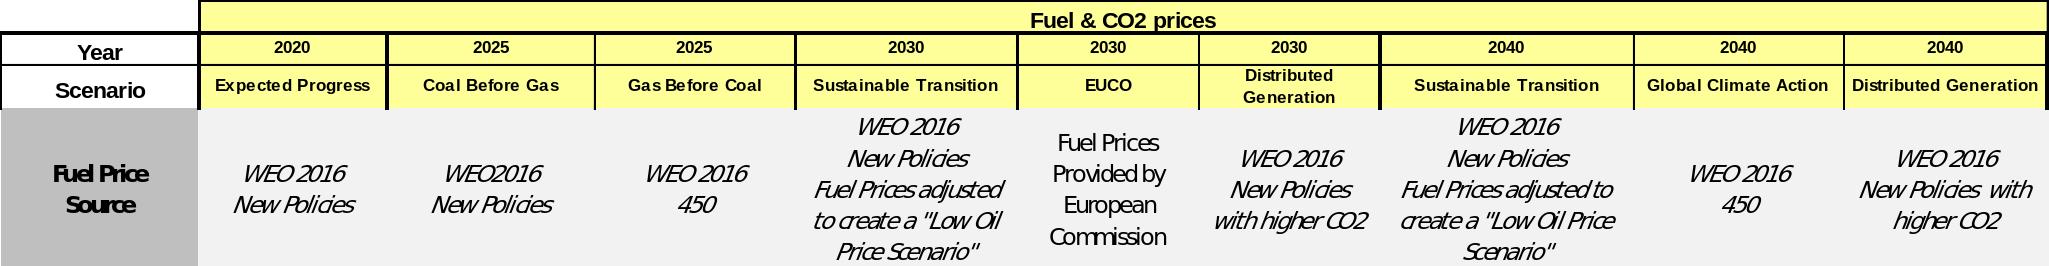 Fuel prices that change depending on the scenario · GitBook